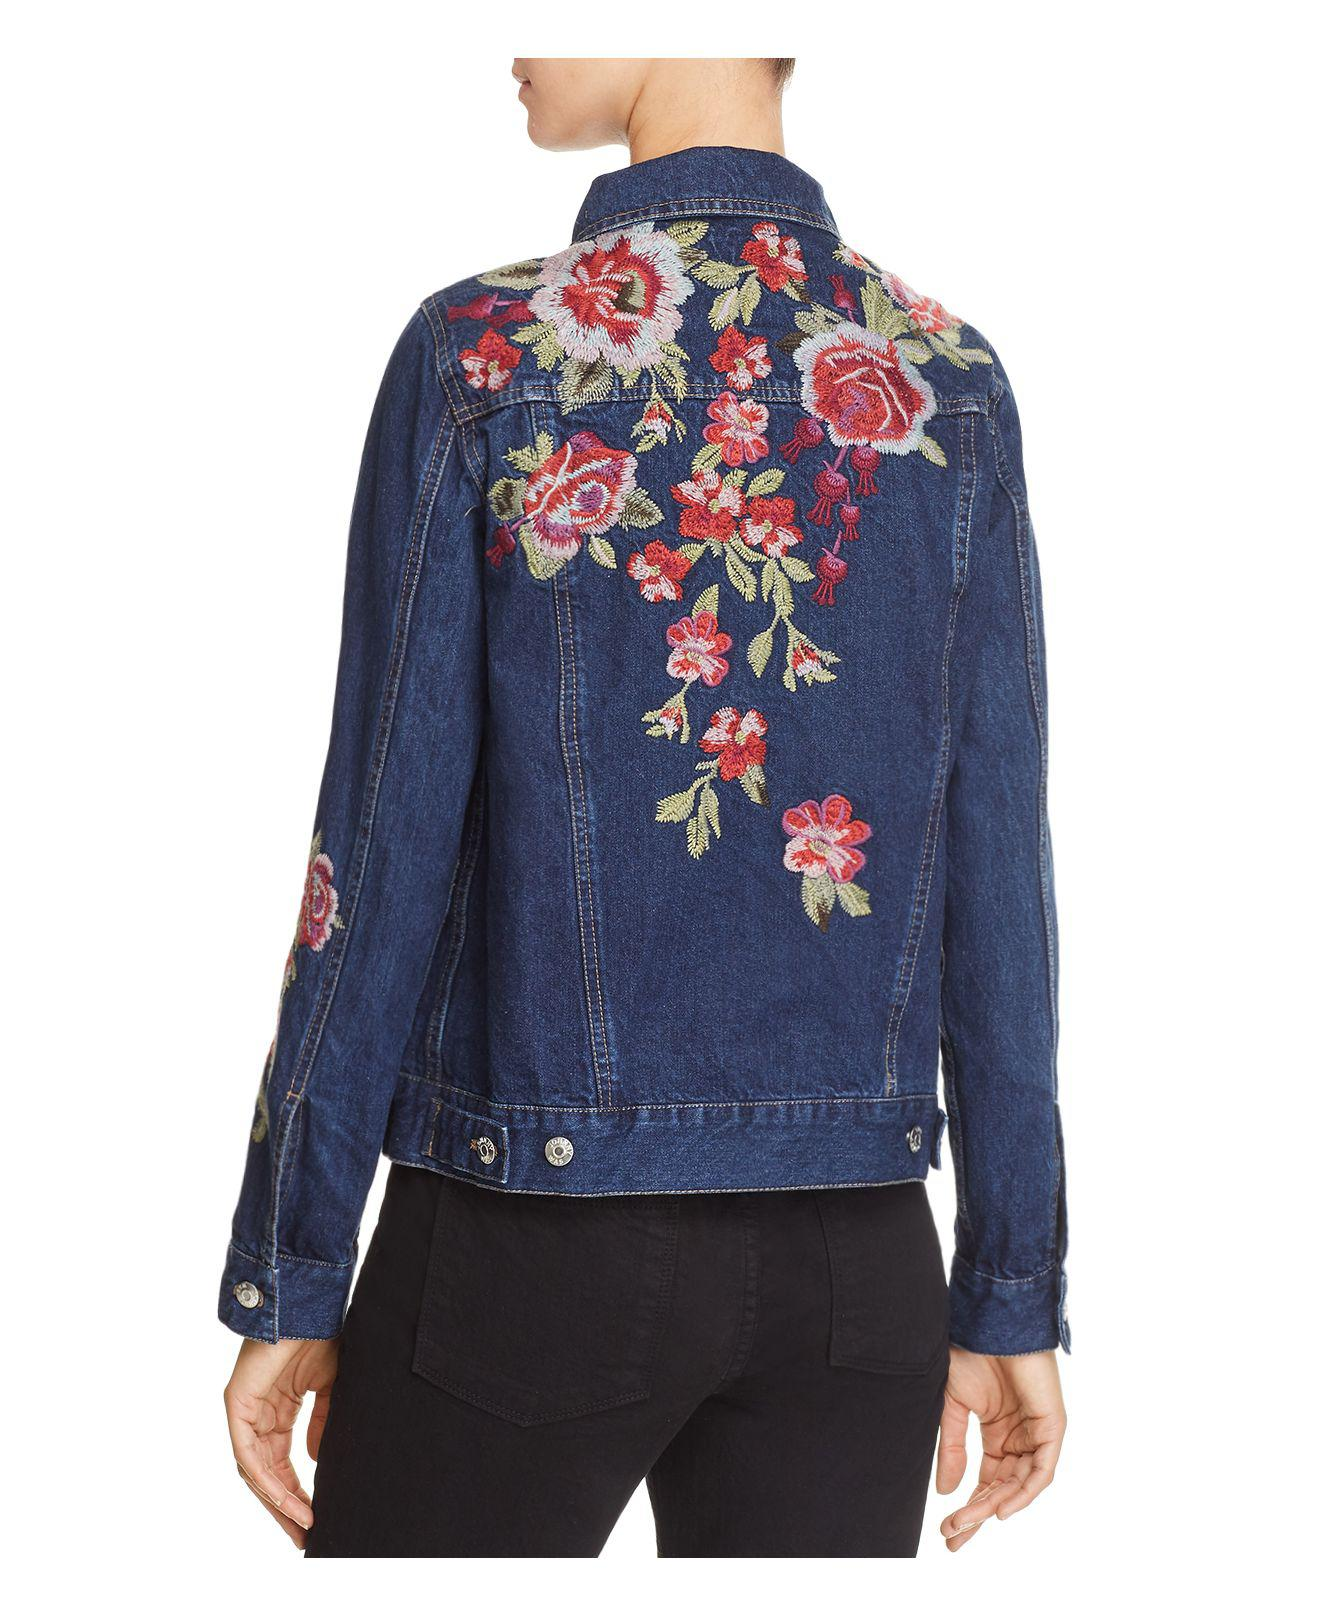 NWT Johnny Was Desi Denim Embroidered Jean Denim Jacket Floral  XXL $278